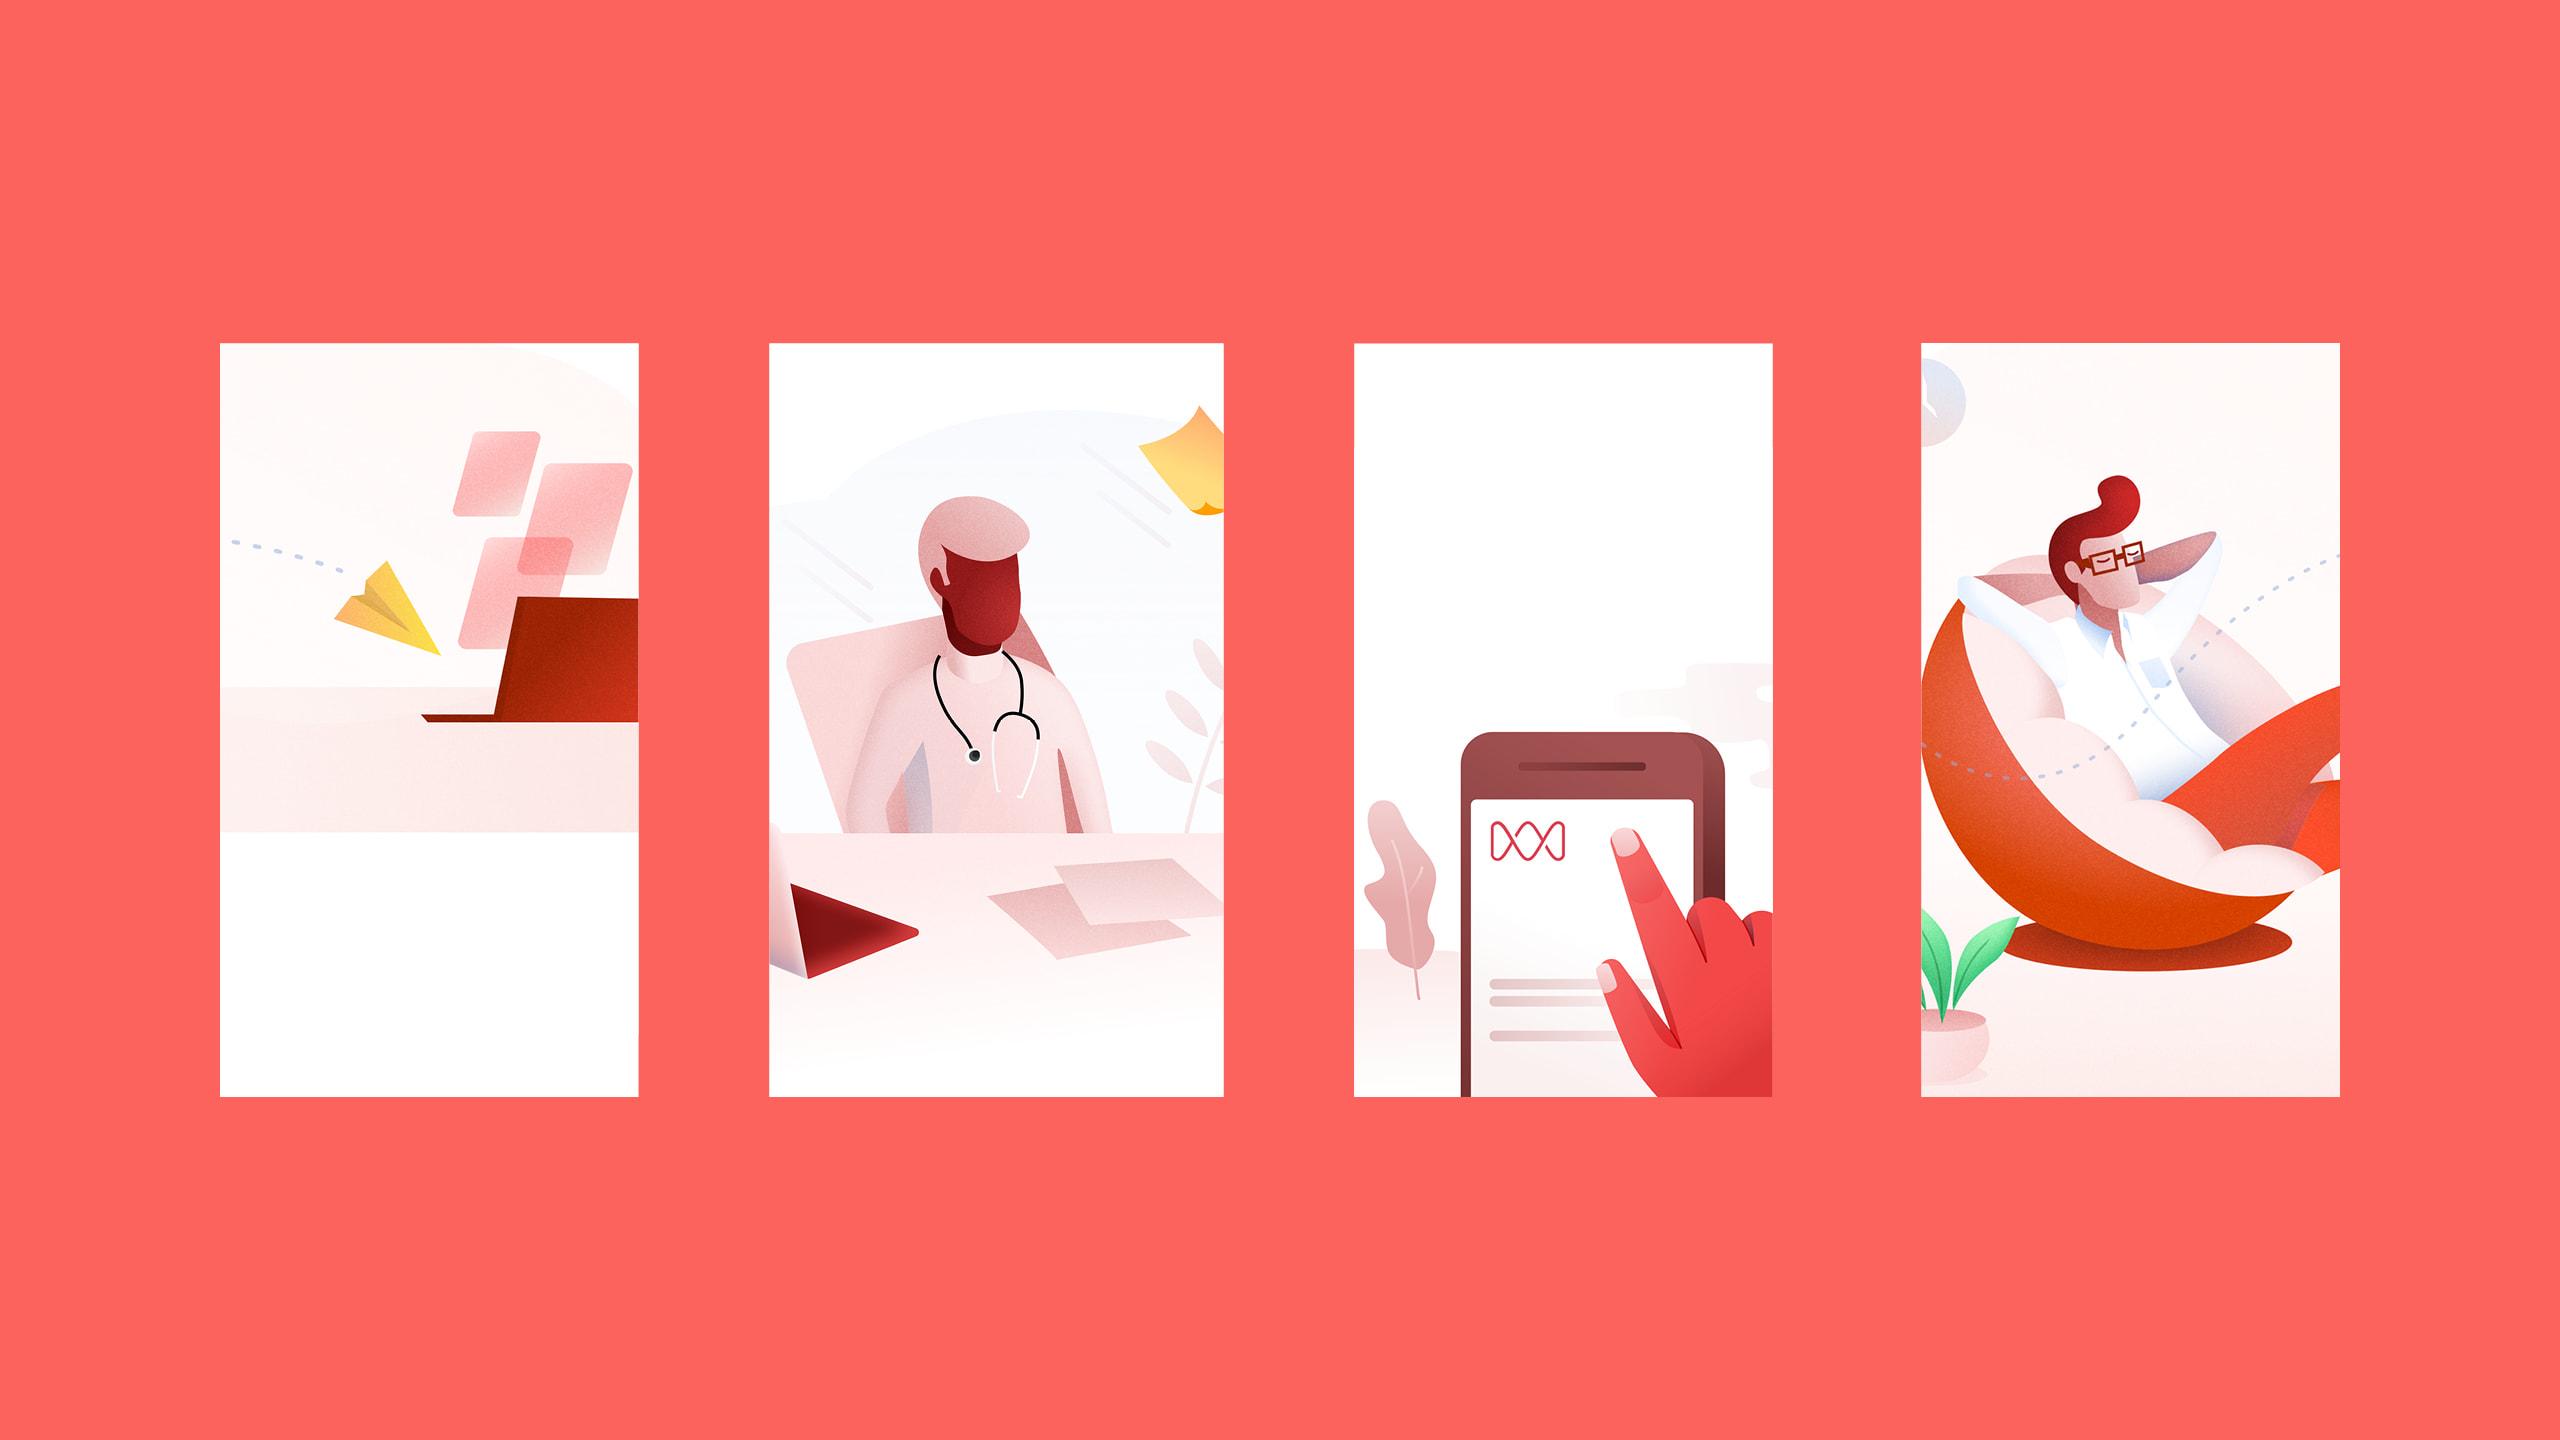 mantik-digital-branding-development-agency-creative-app-ui-web-branding-211-min